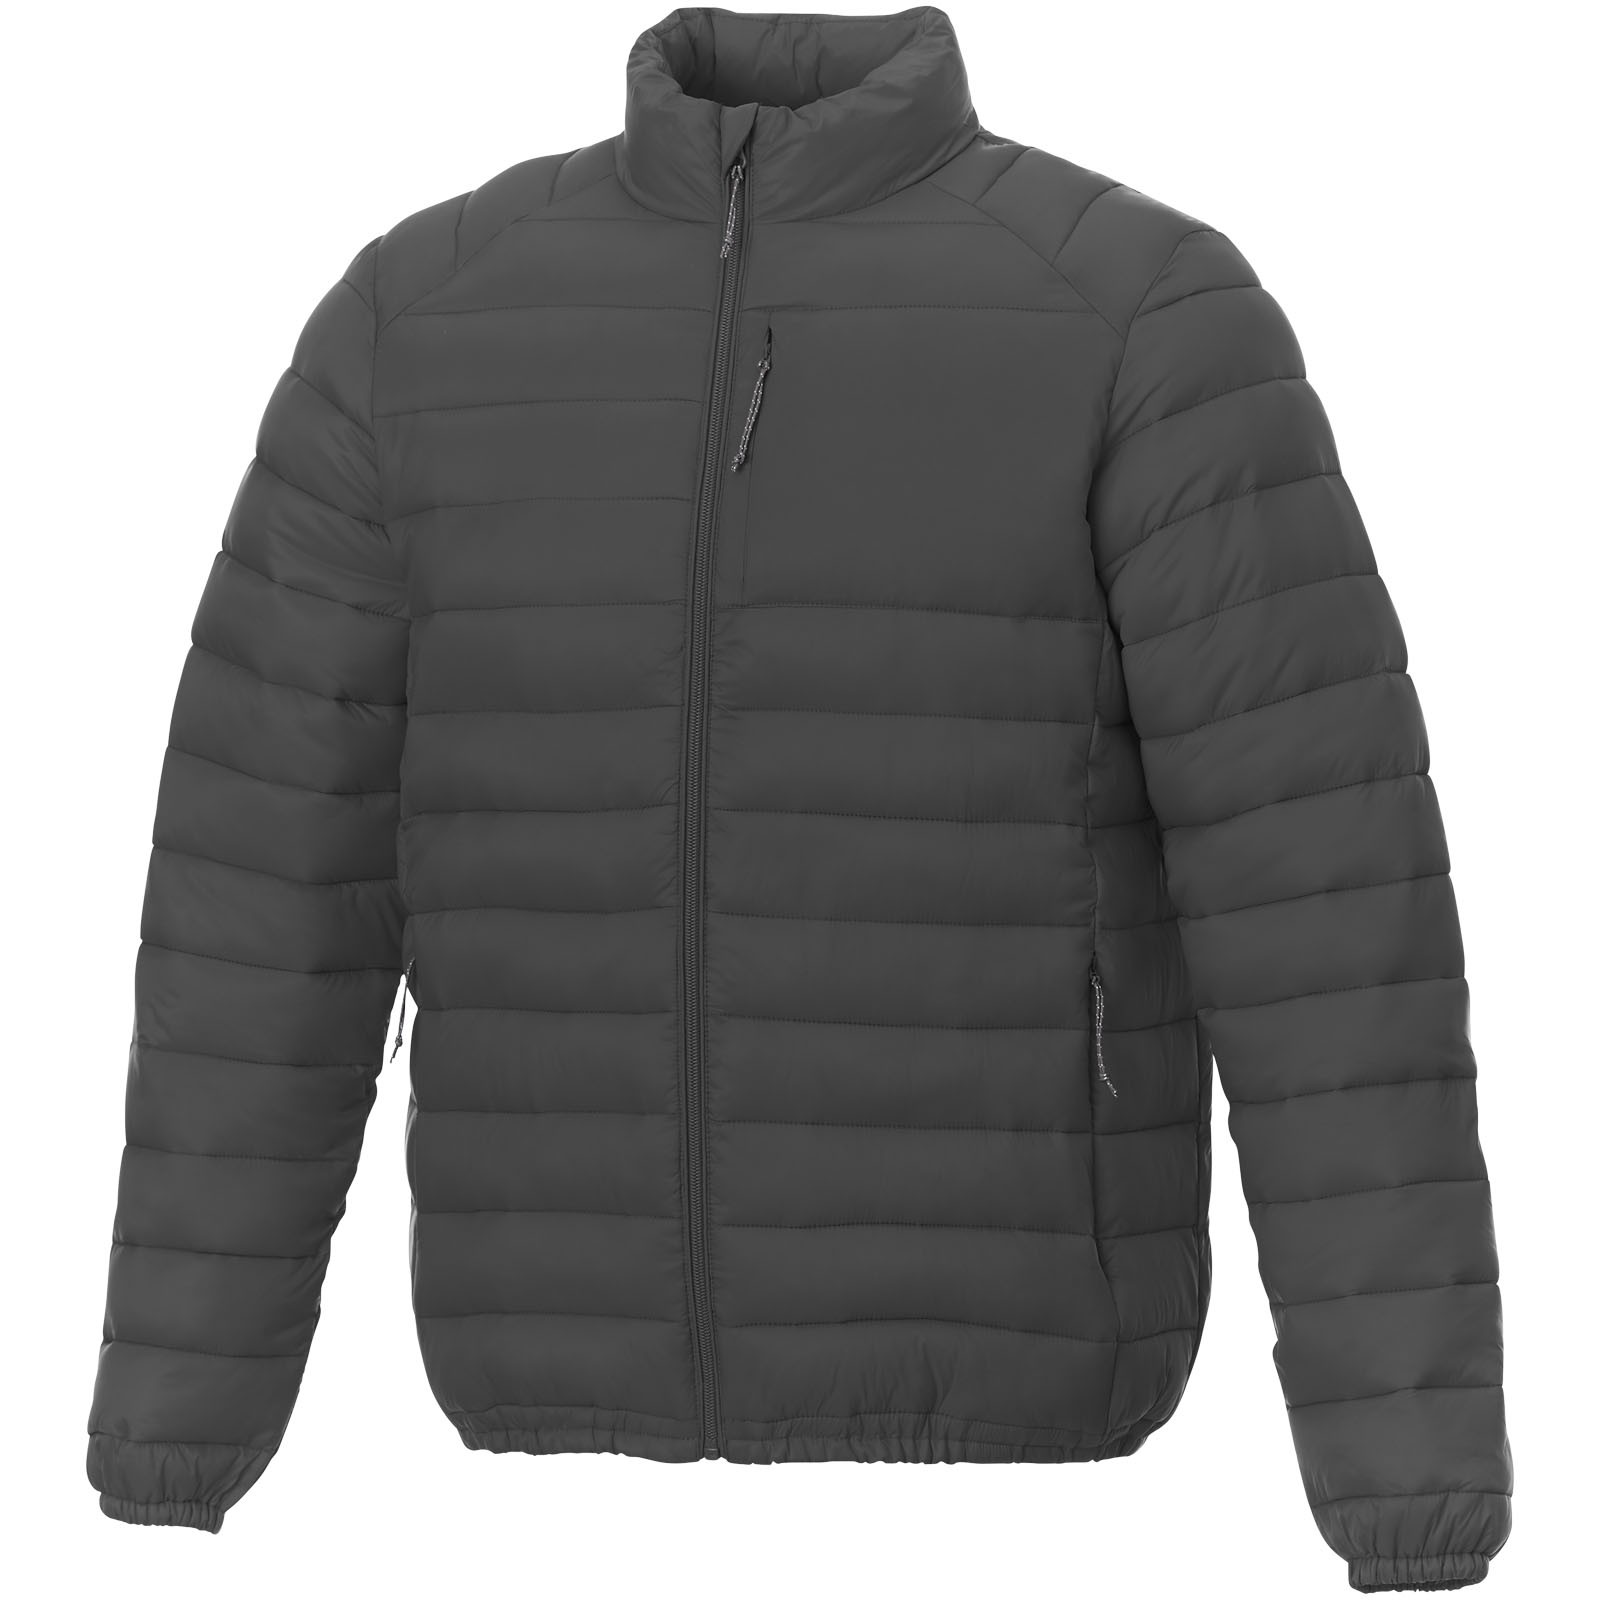 Athenas men's insulated jacket - Storm Grey / S